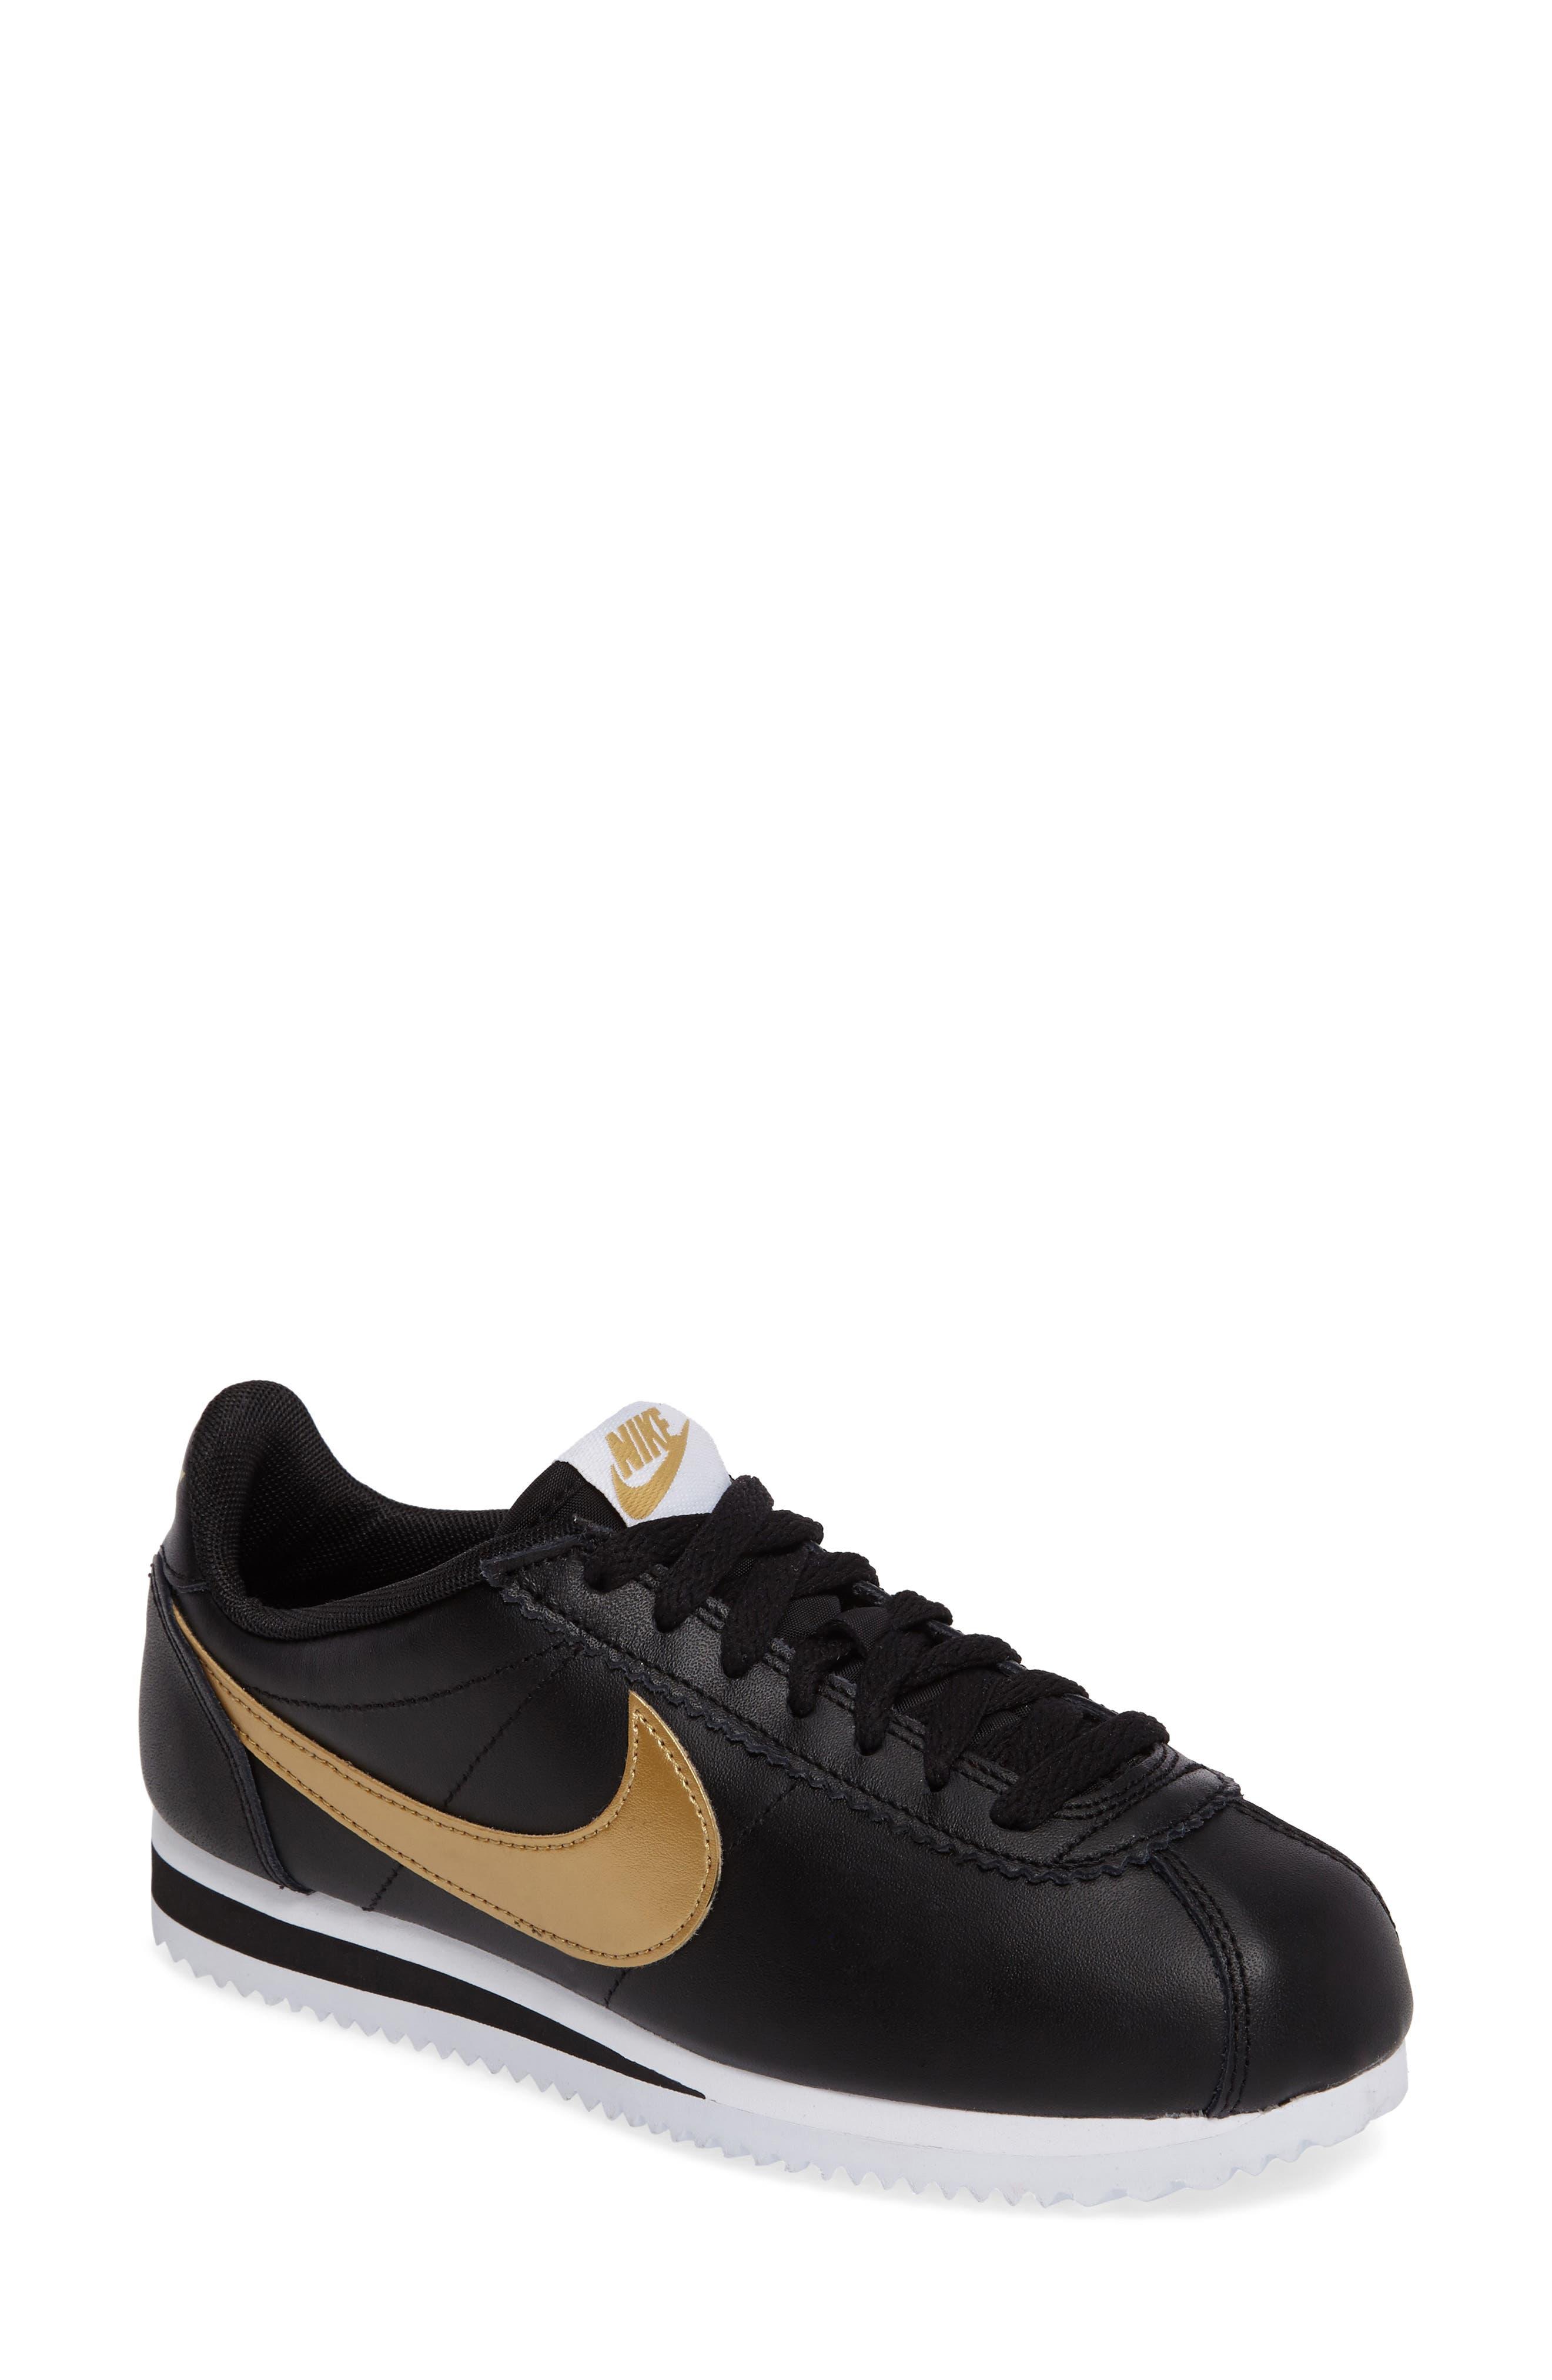 ad57598712 ... czech soldier 10 and lebron 14. classic nike shoes women d6d26 e6b4c